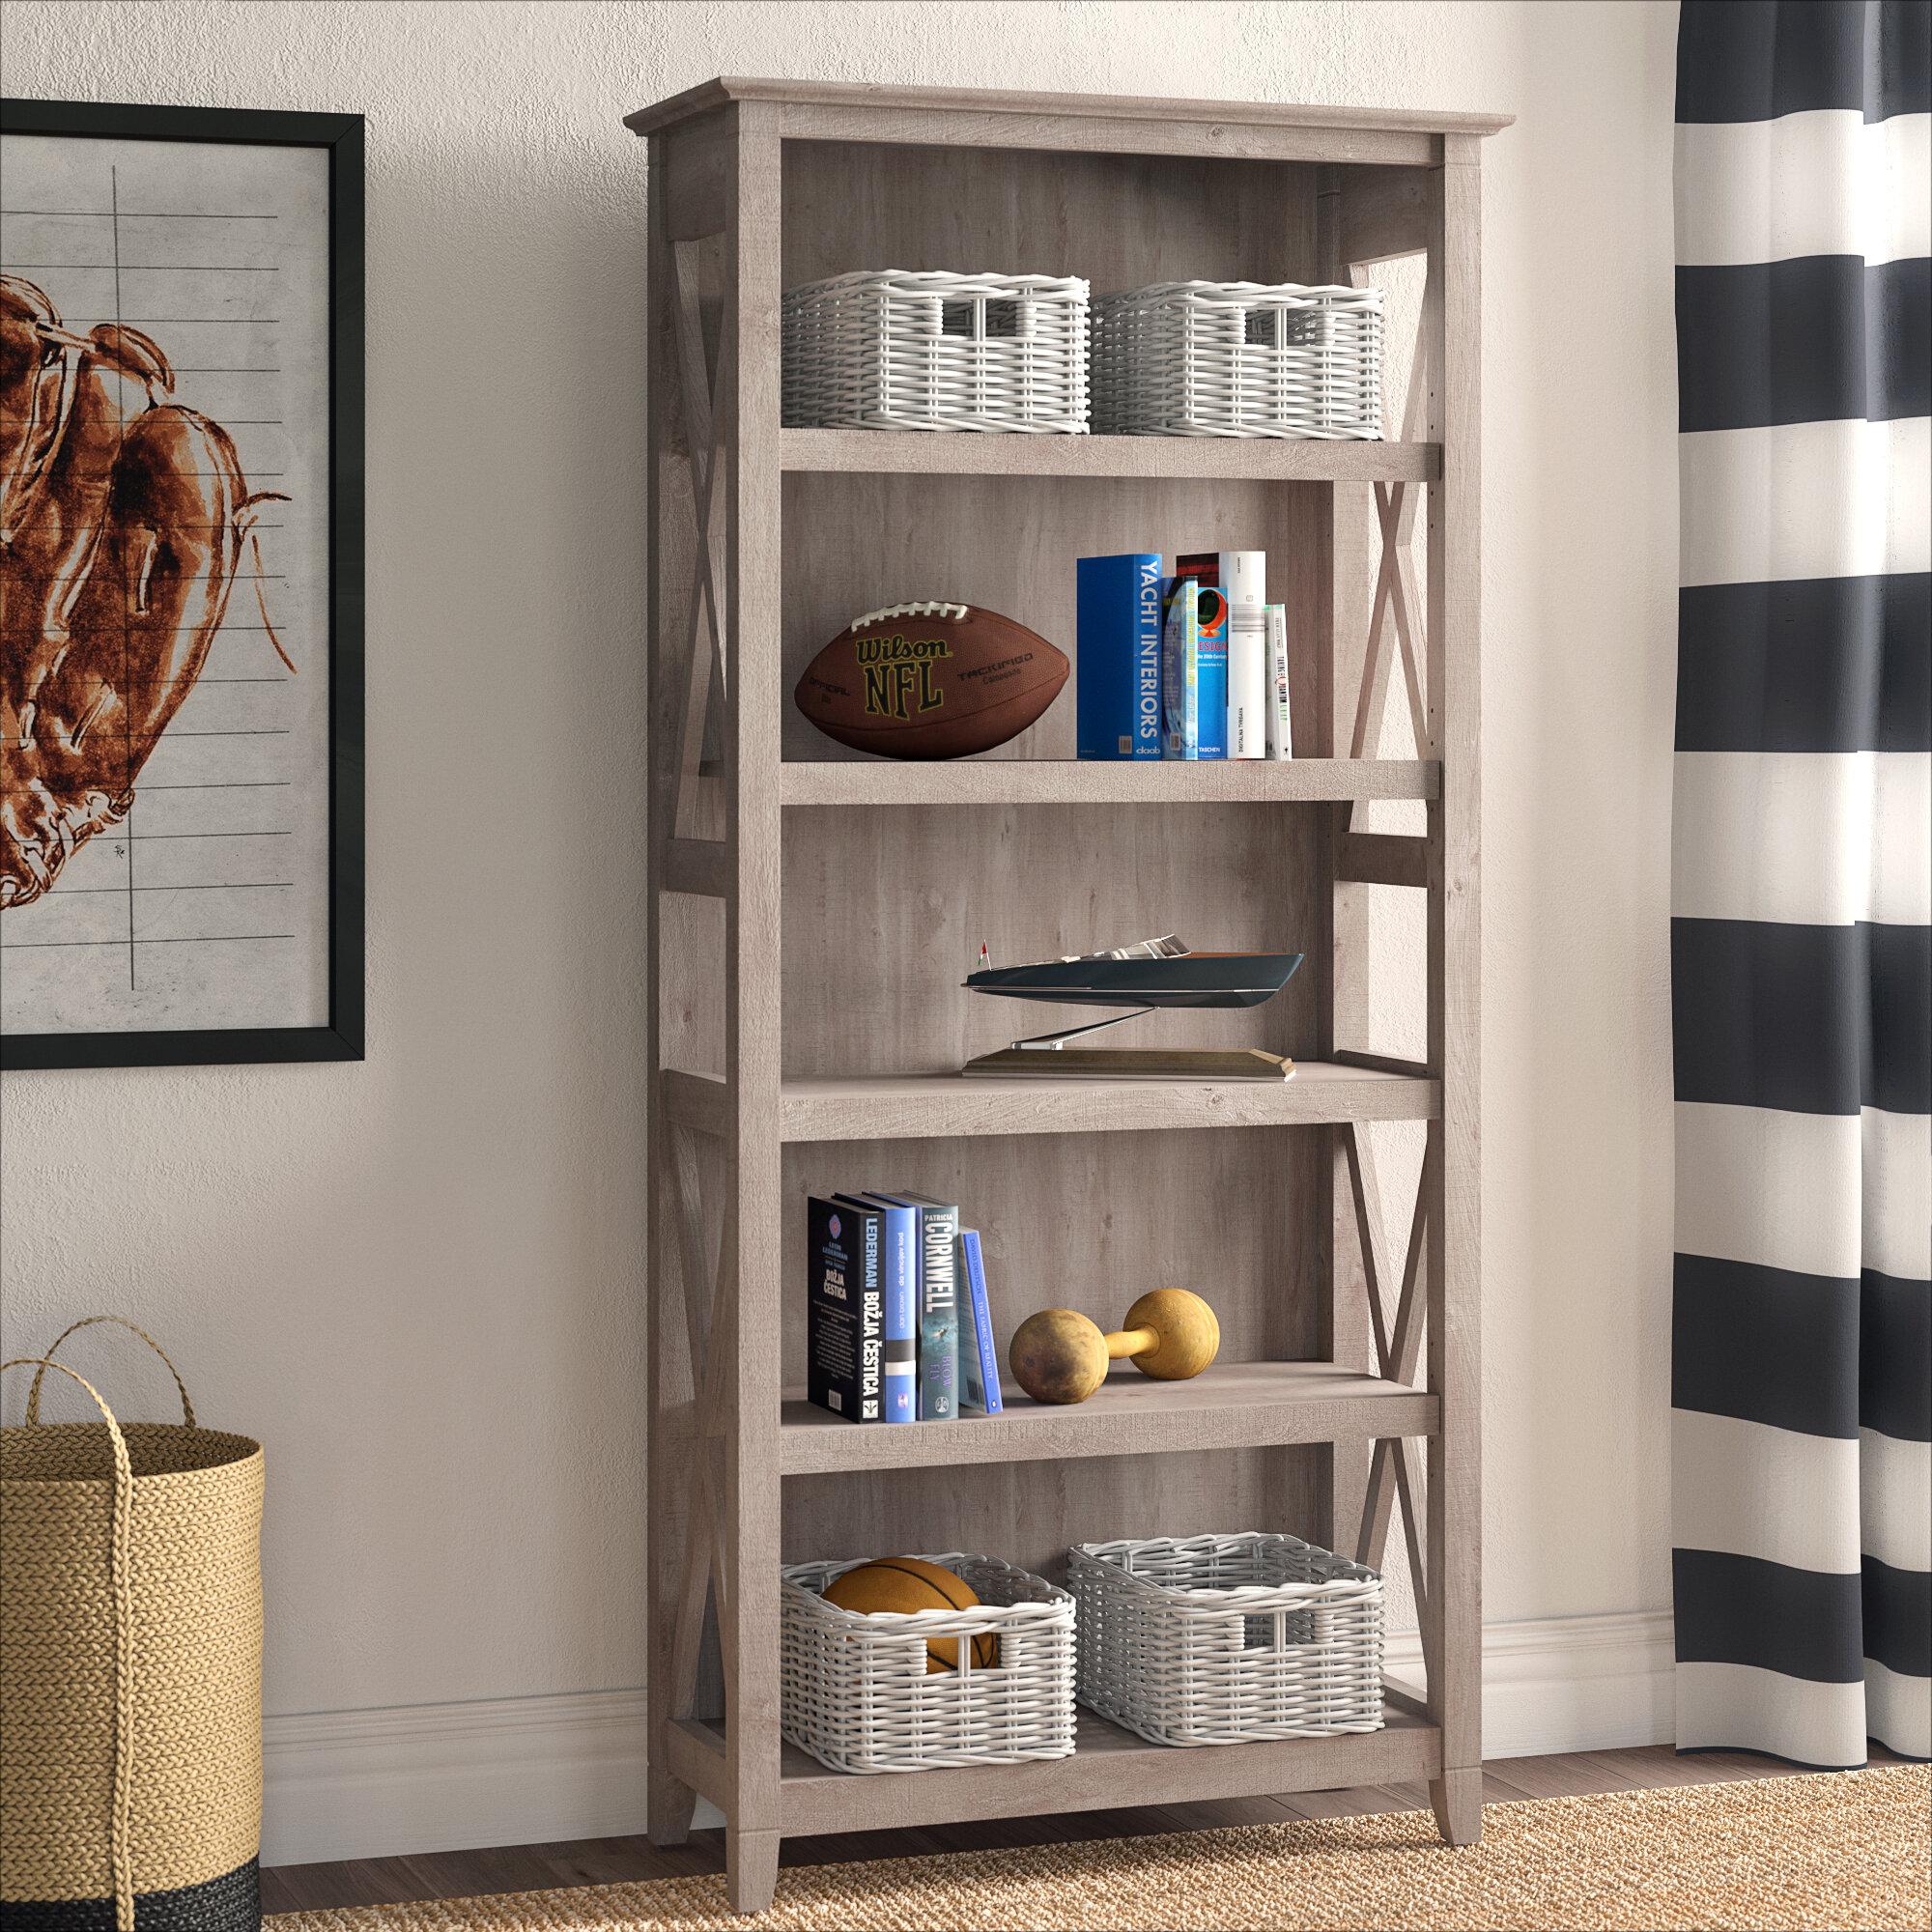 Beachcrest Home Cyra 65 98 H X 31 73 W Standard Bookcase Reviews Wayfair